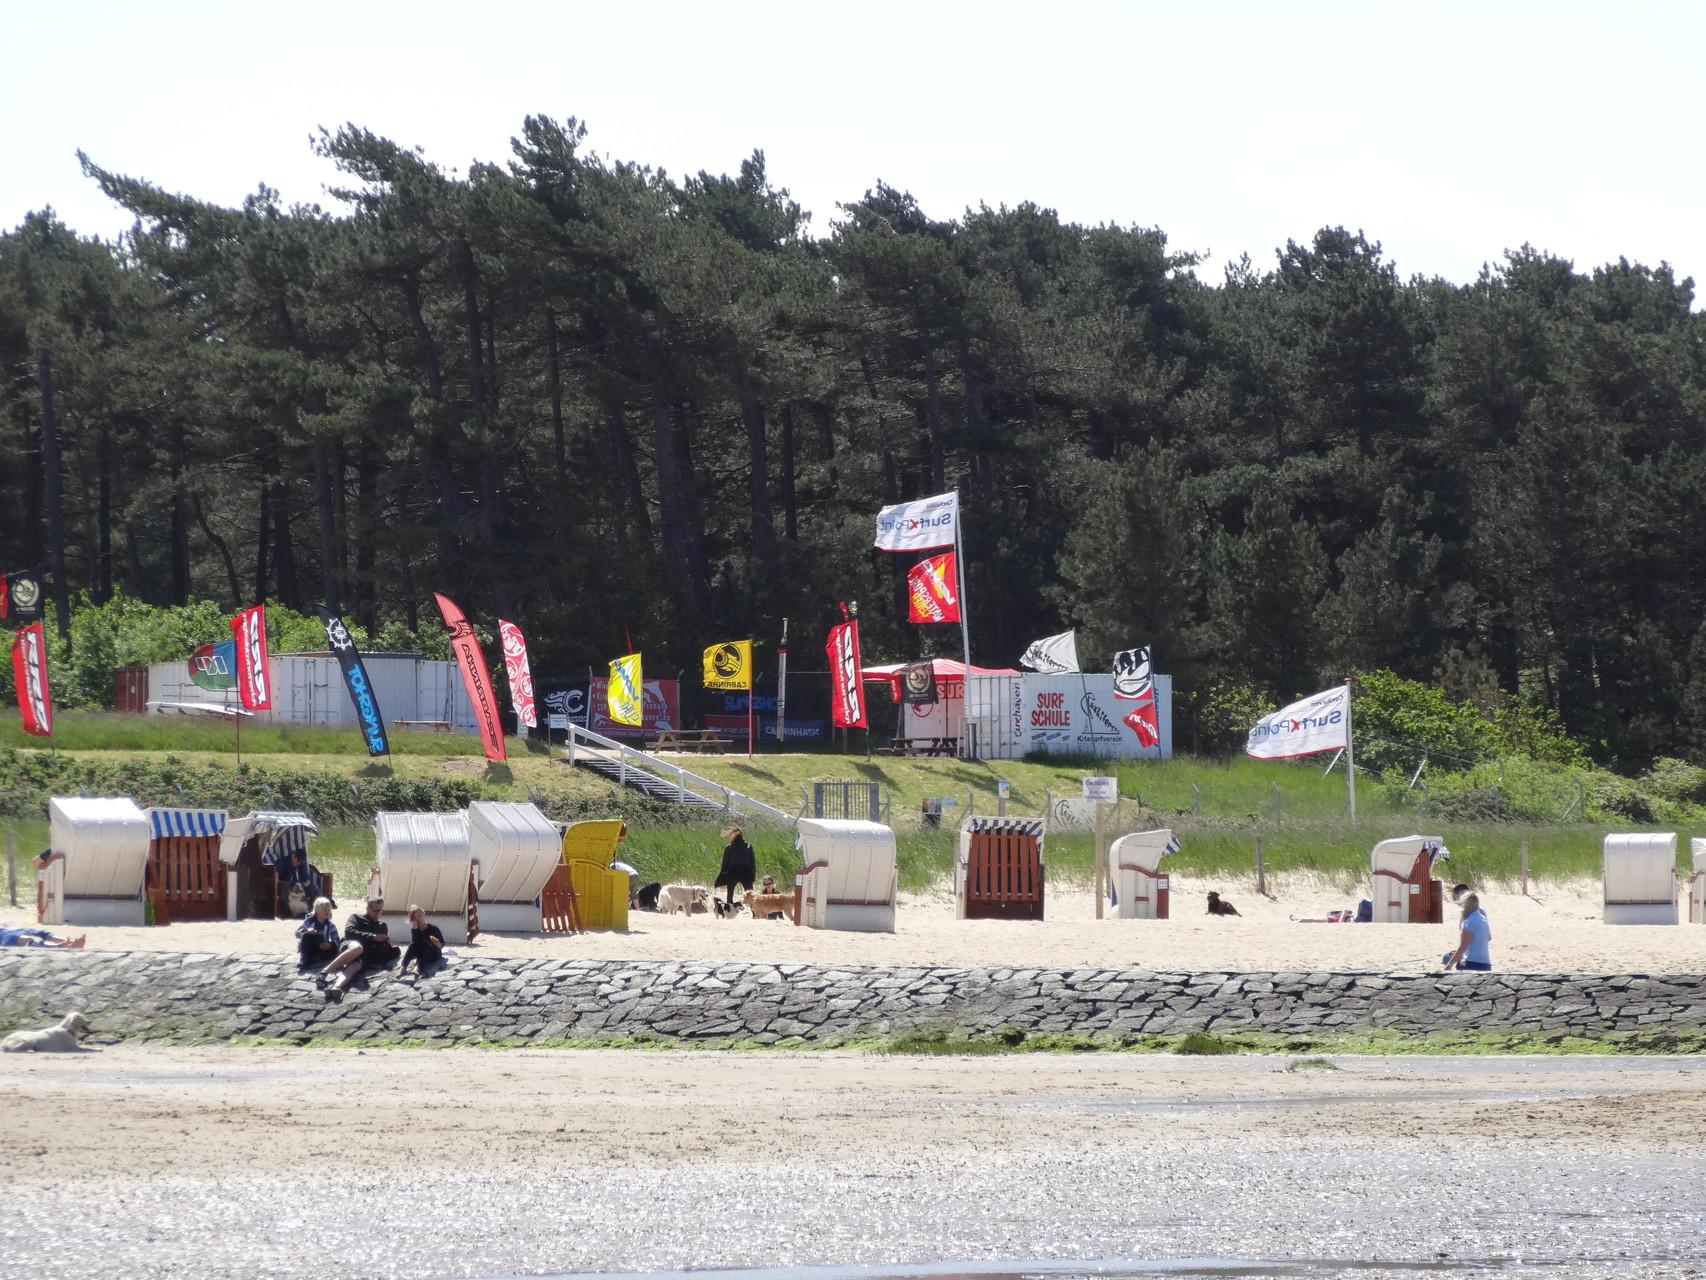 Surfschule am Strand in Cuxhaven Sahlenburg